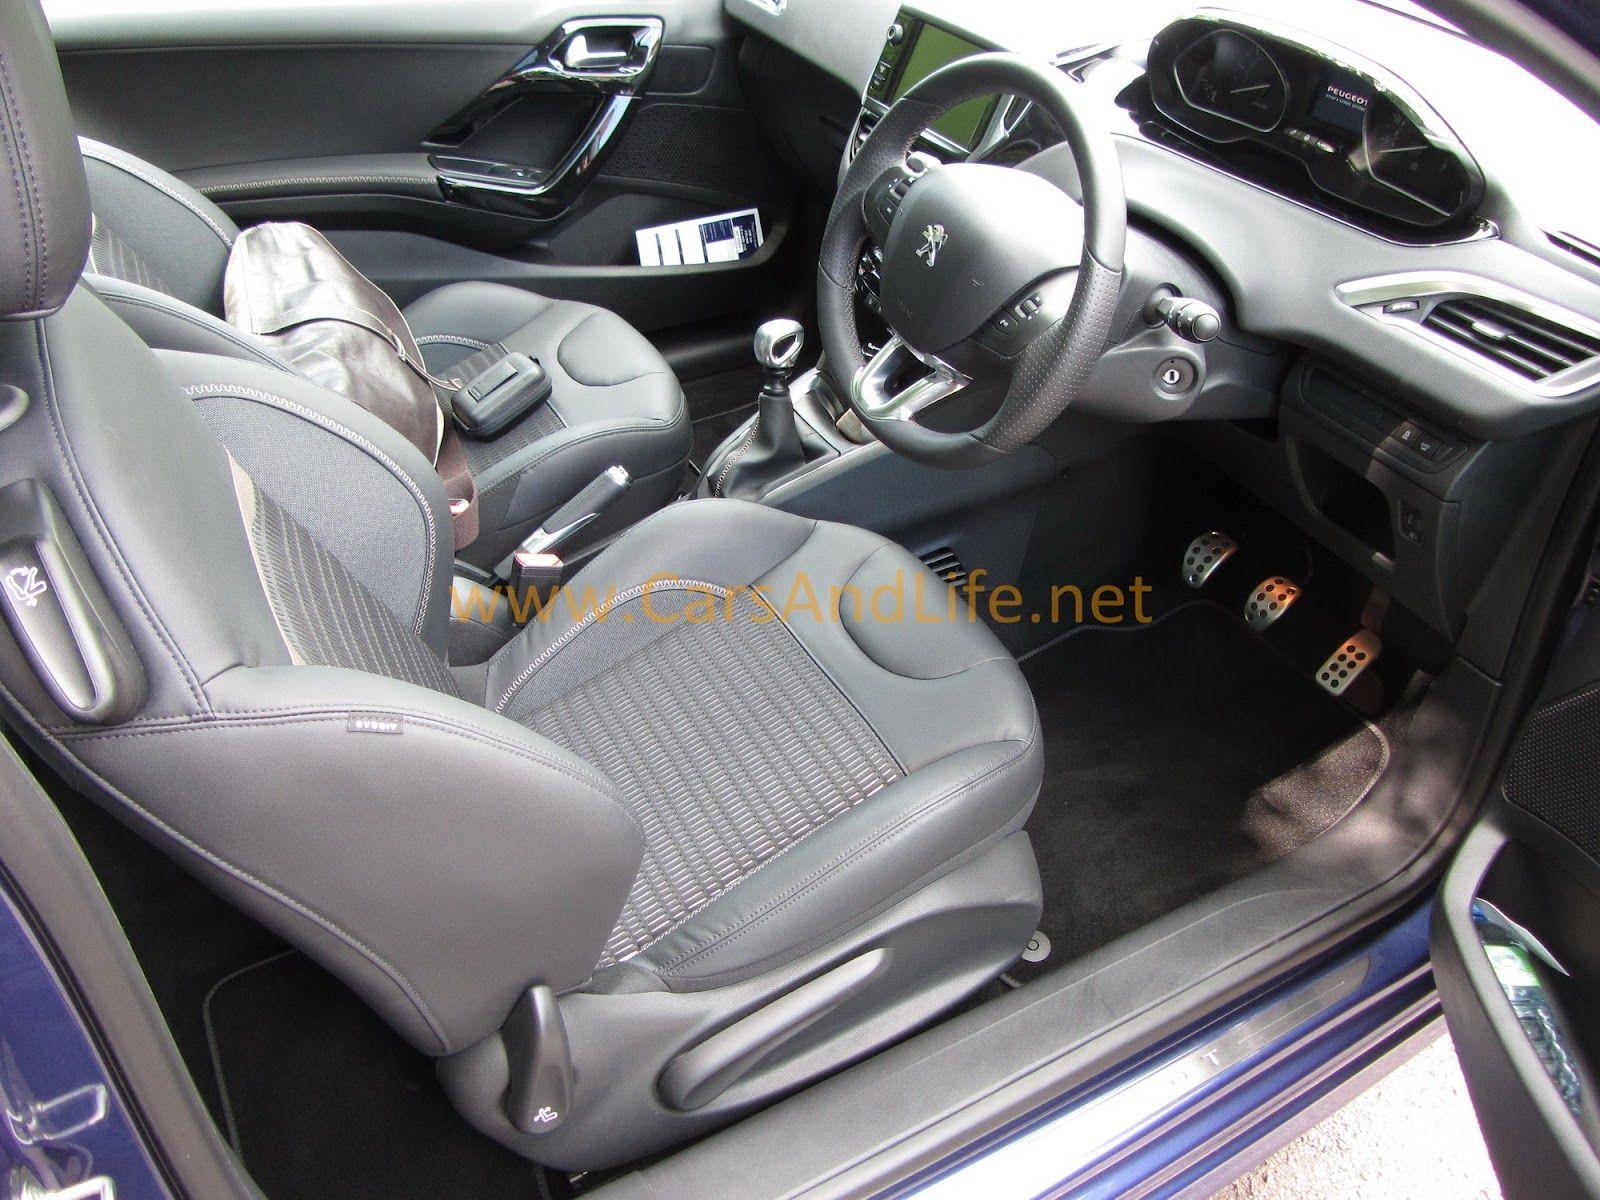 Cars & Life: Peugeot 208 Press Launch My Live Tweets #peugeot208 #peugeot #cars http://uygarr.blogspot.co.uk/search/label/Peugeot%20208